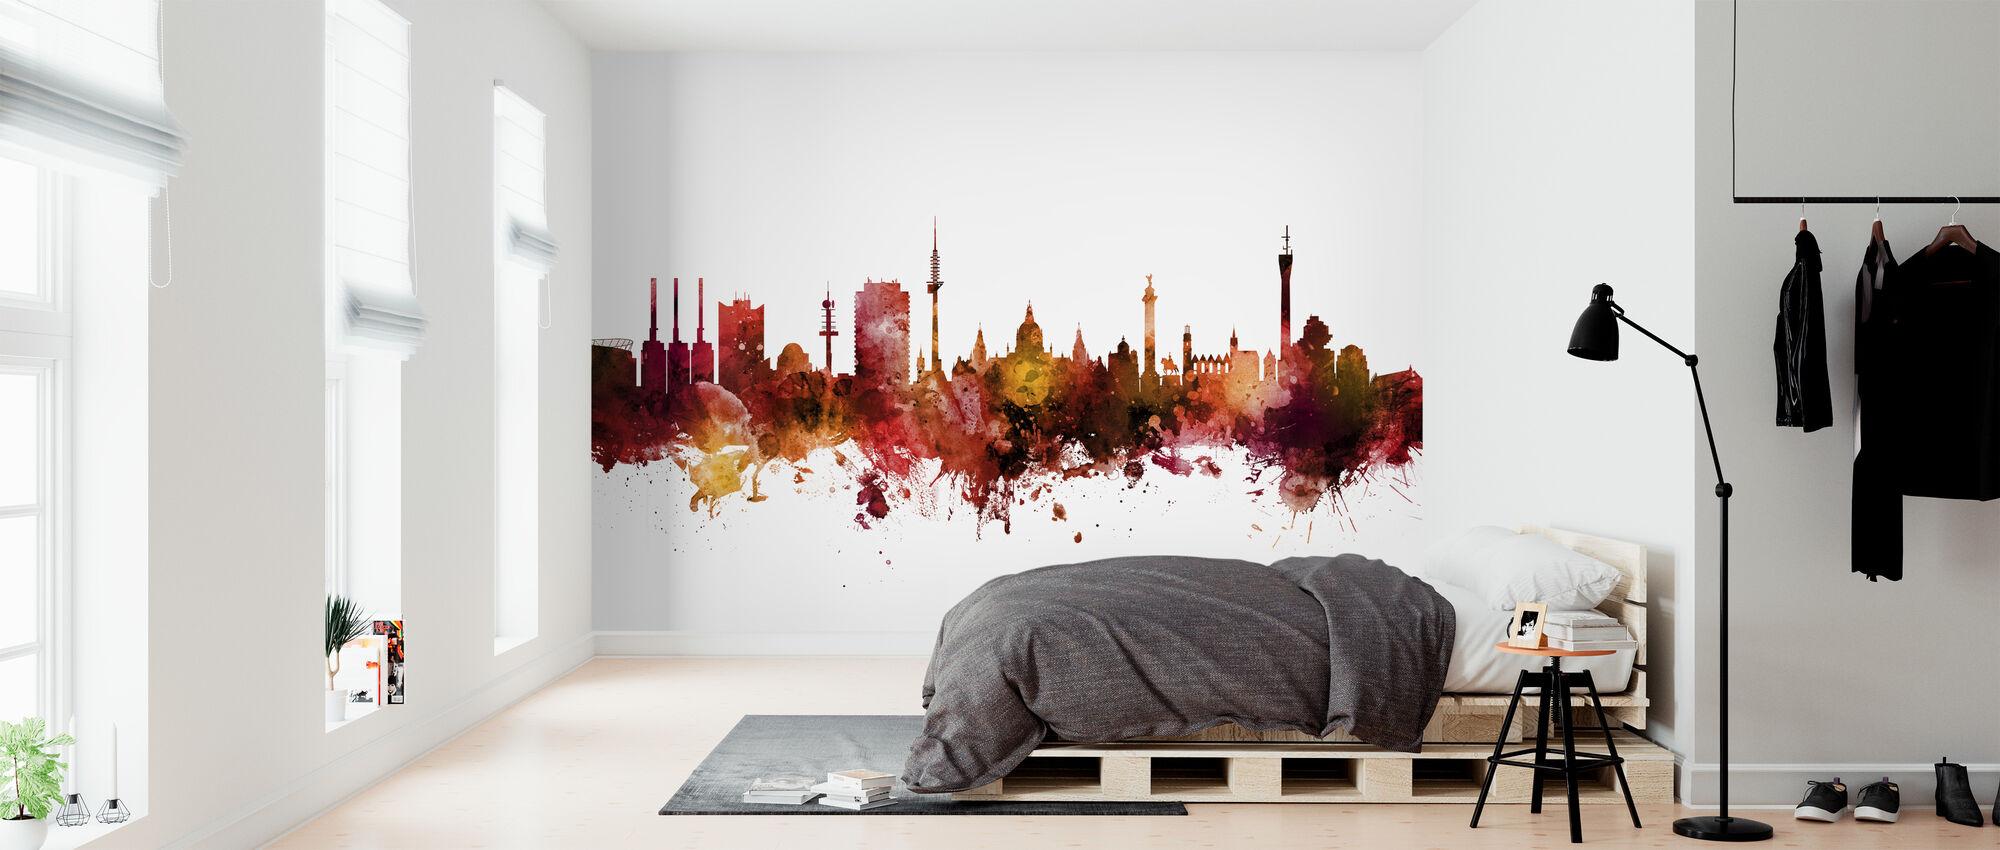 Hannover Germany Skyline - Wallpaper - Bedroom